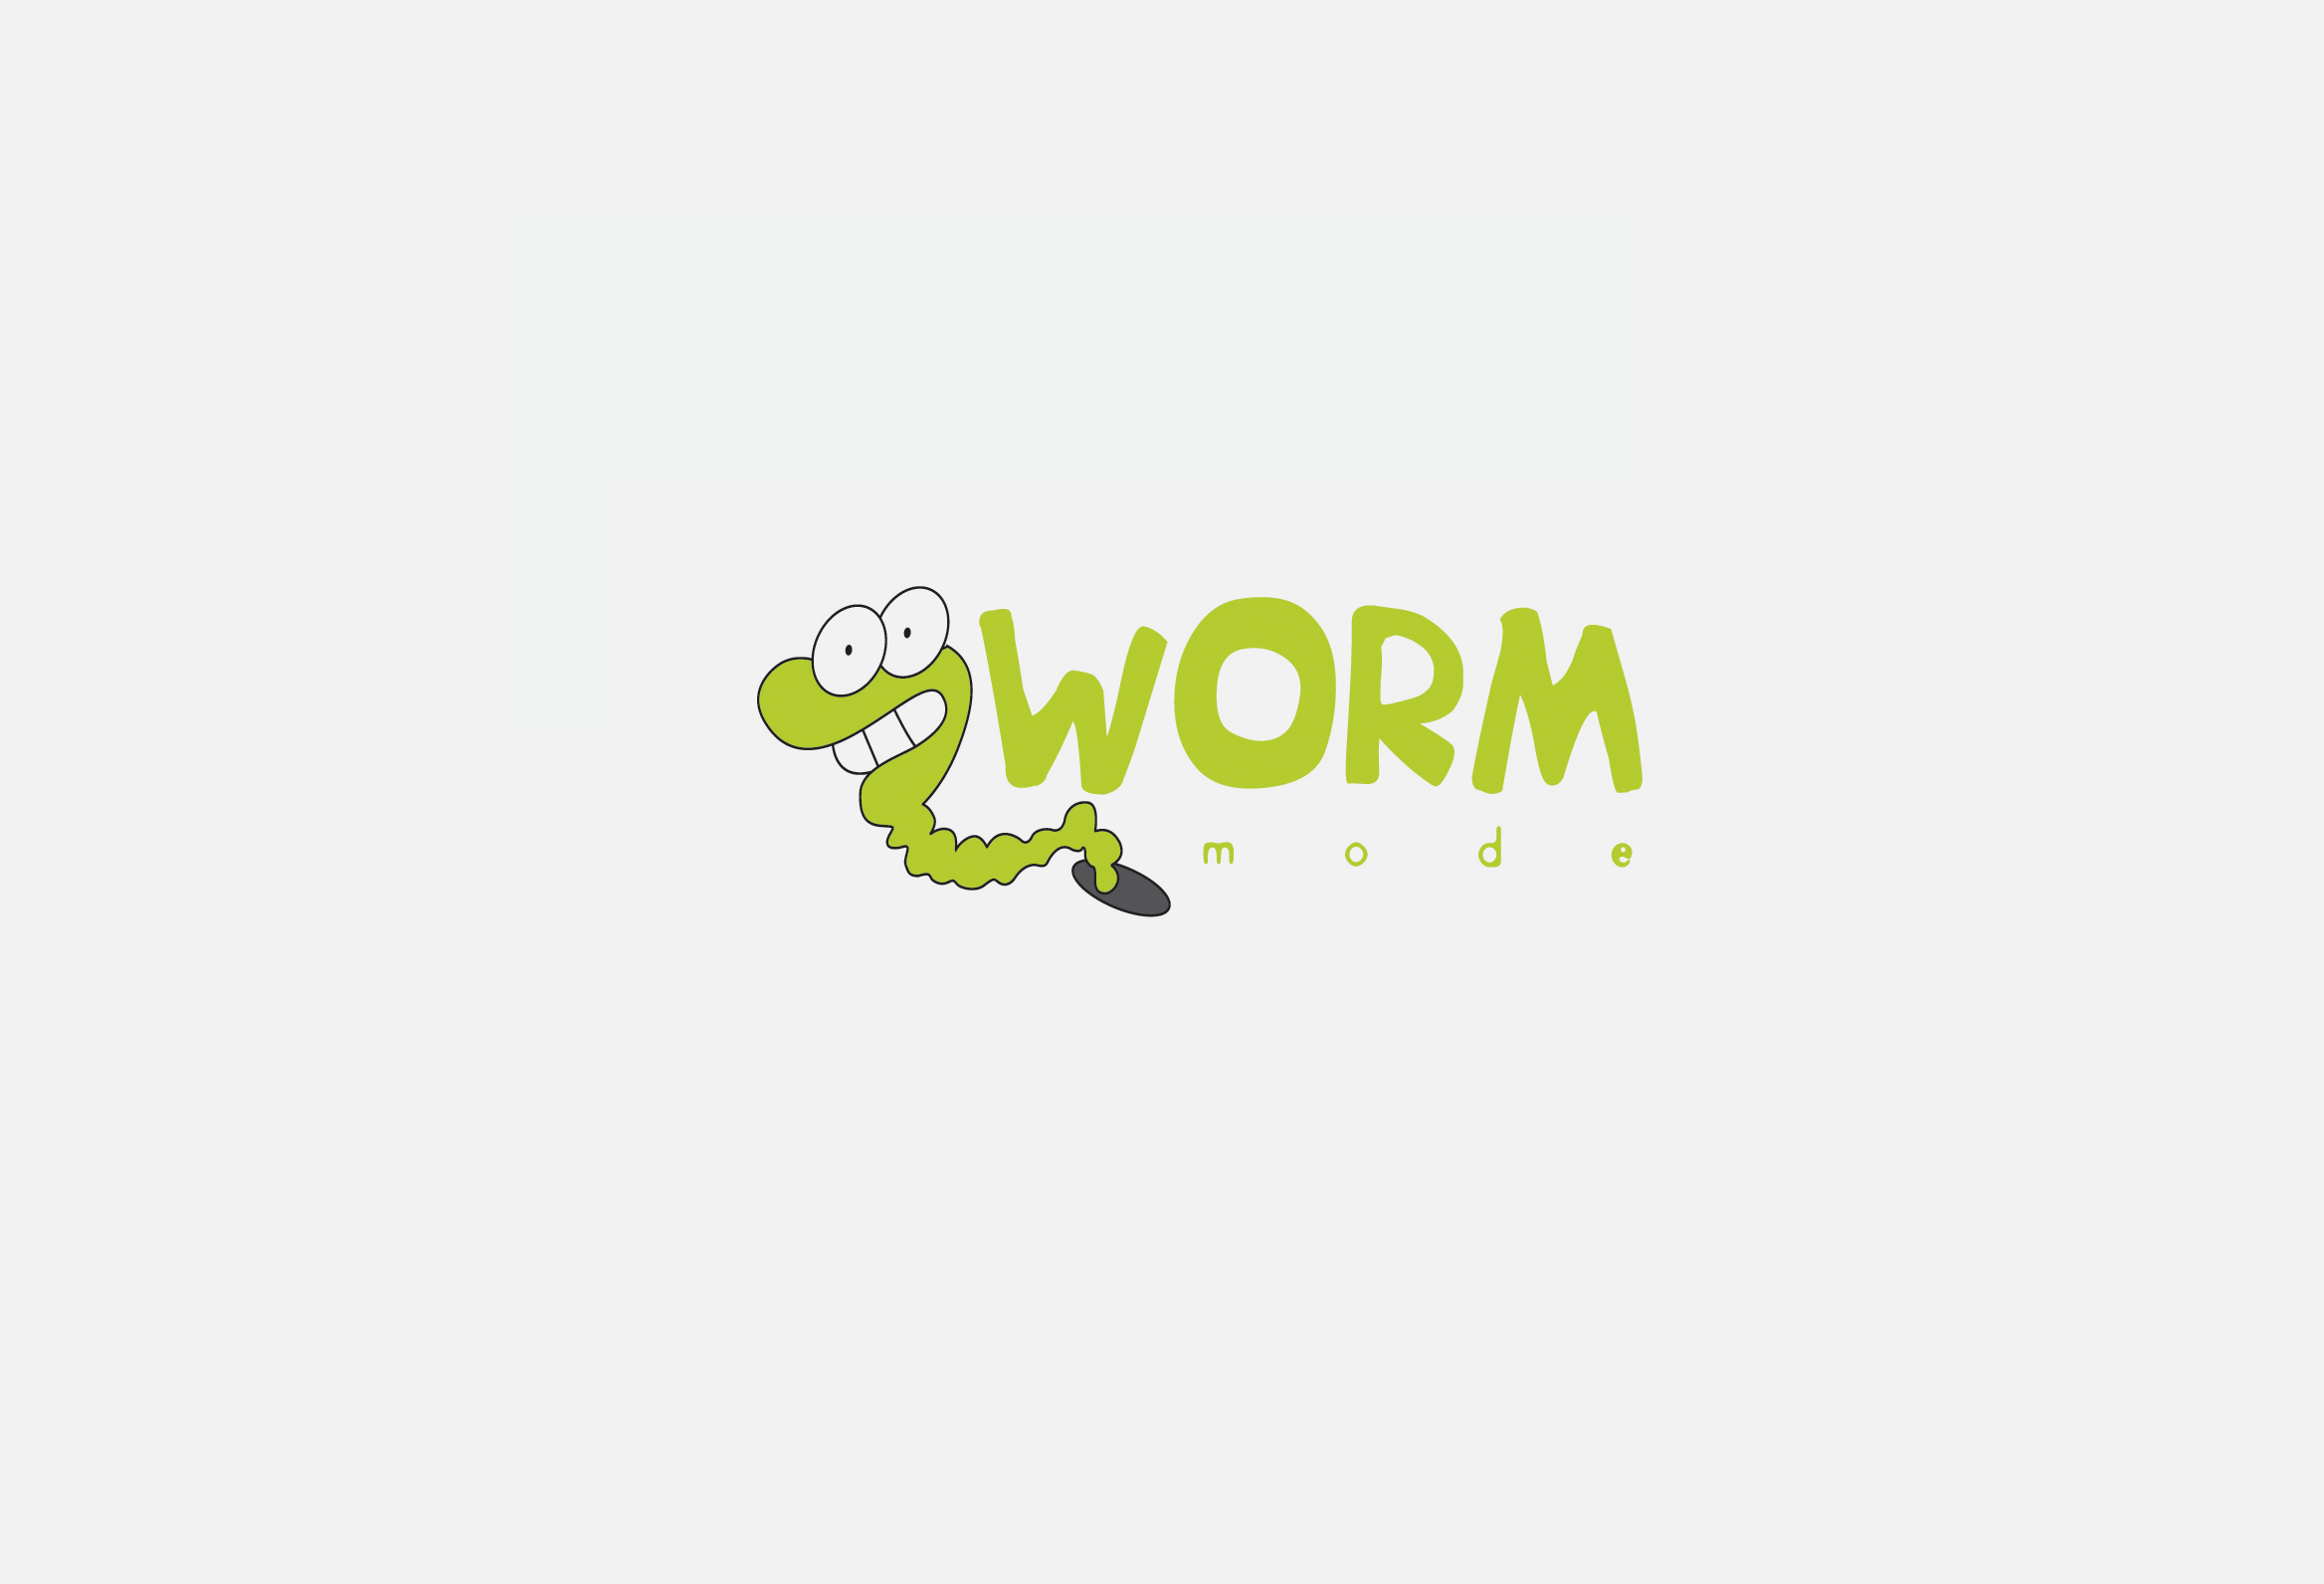 Worm mode